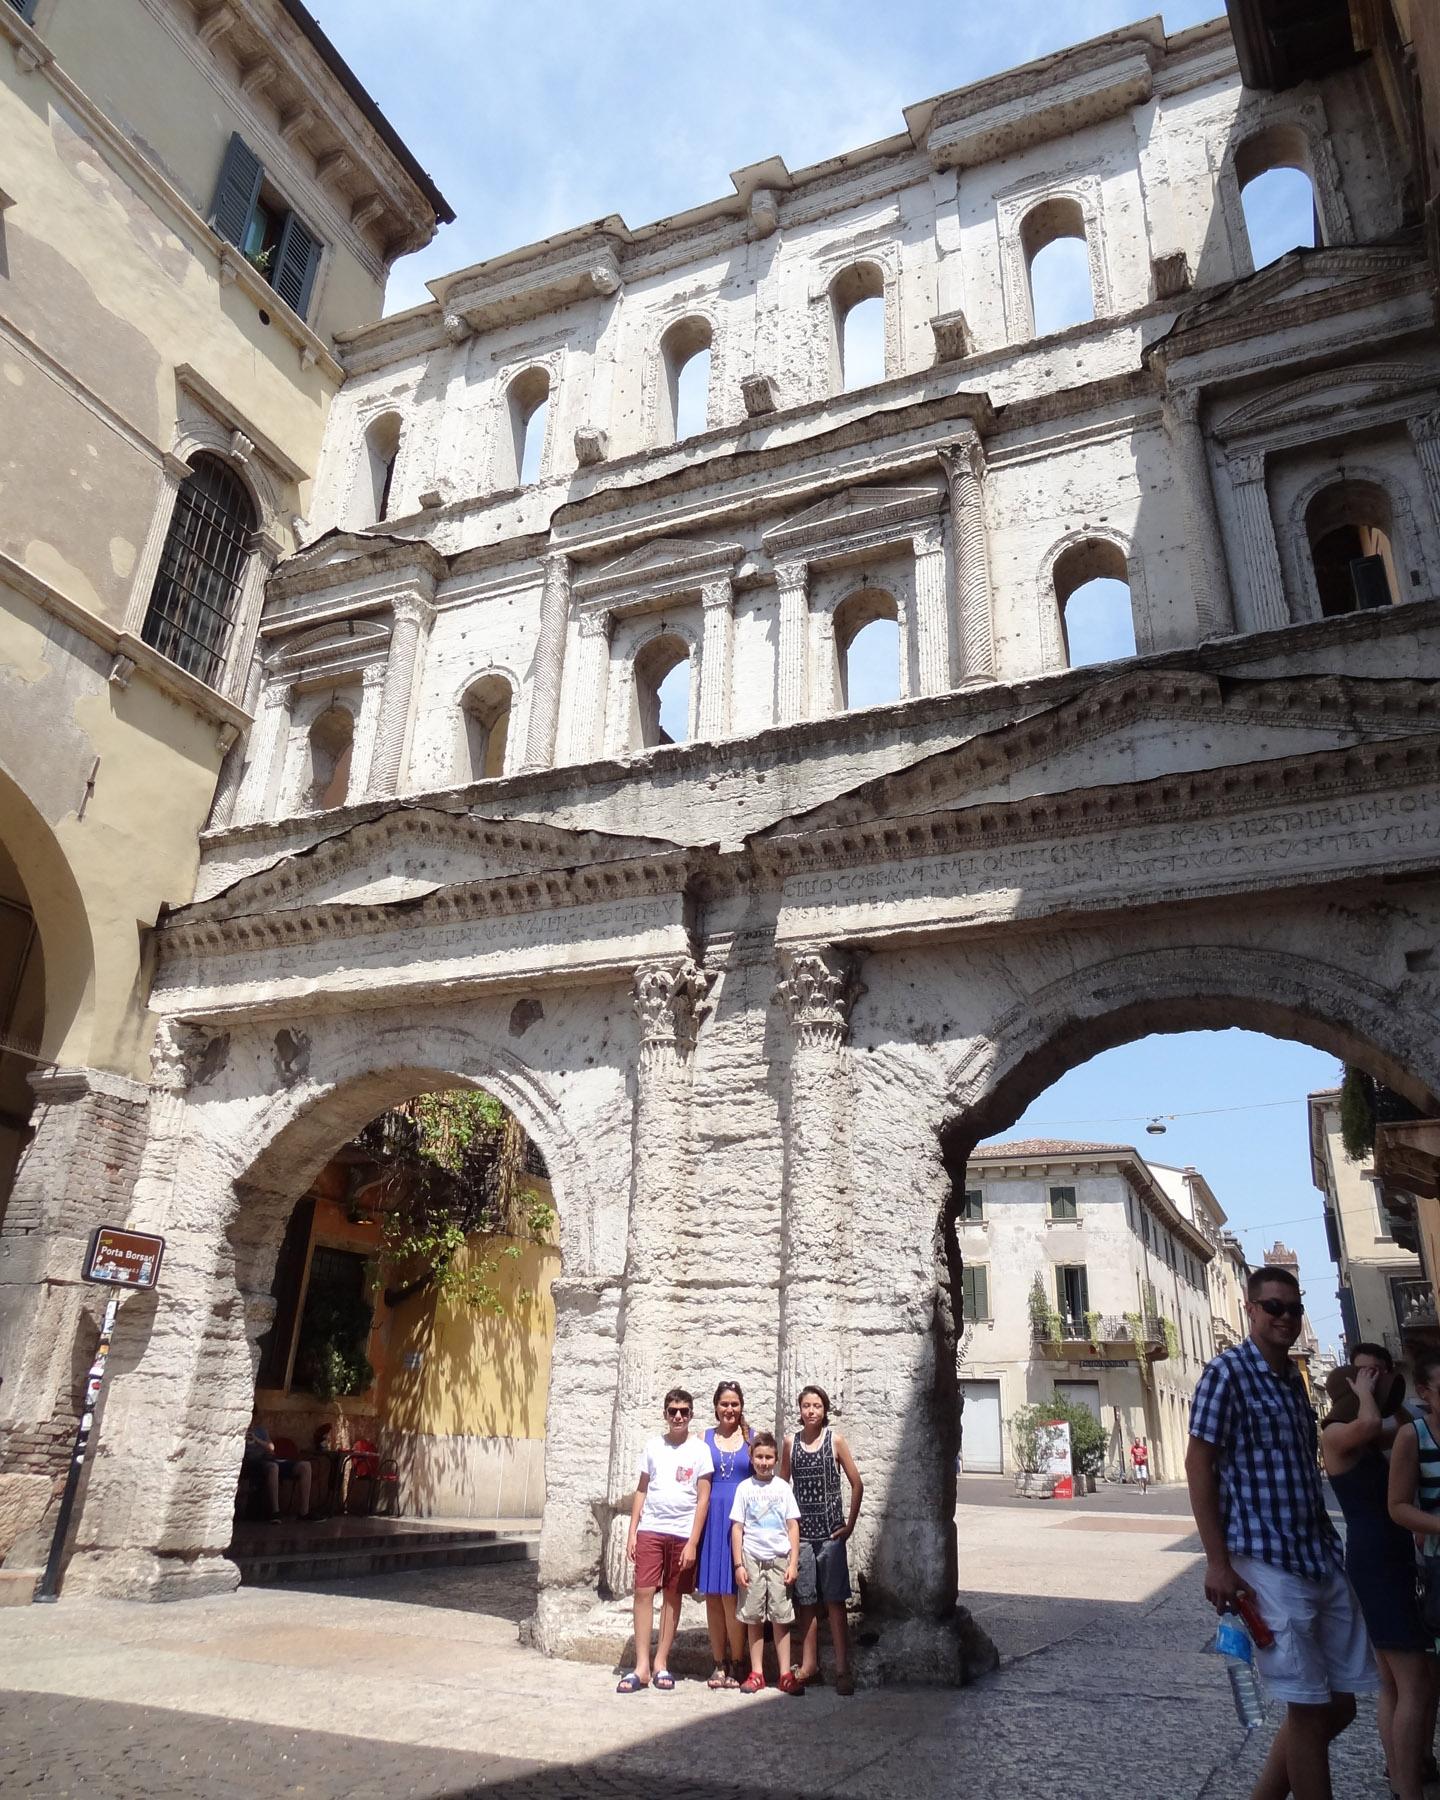 Roman Aqueduct, Verona, Italy 2015